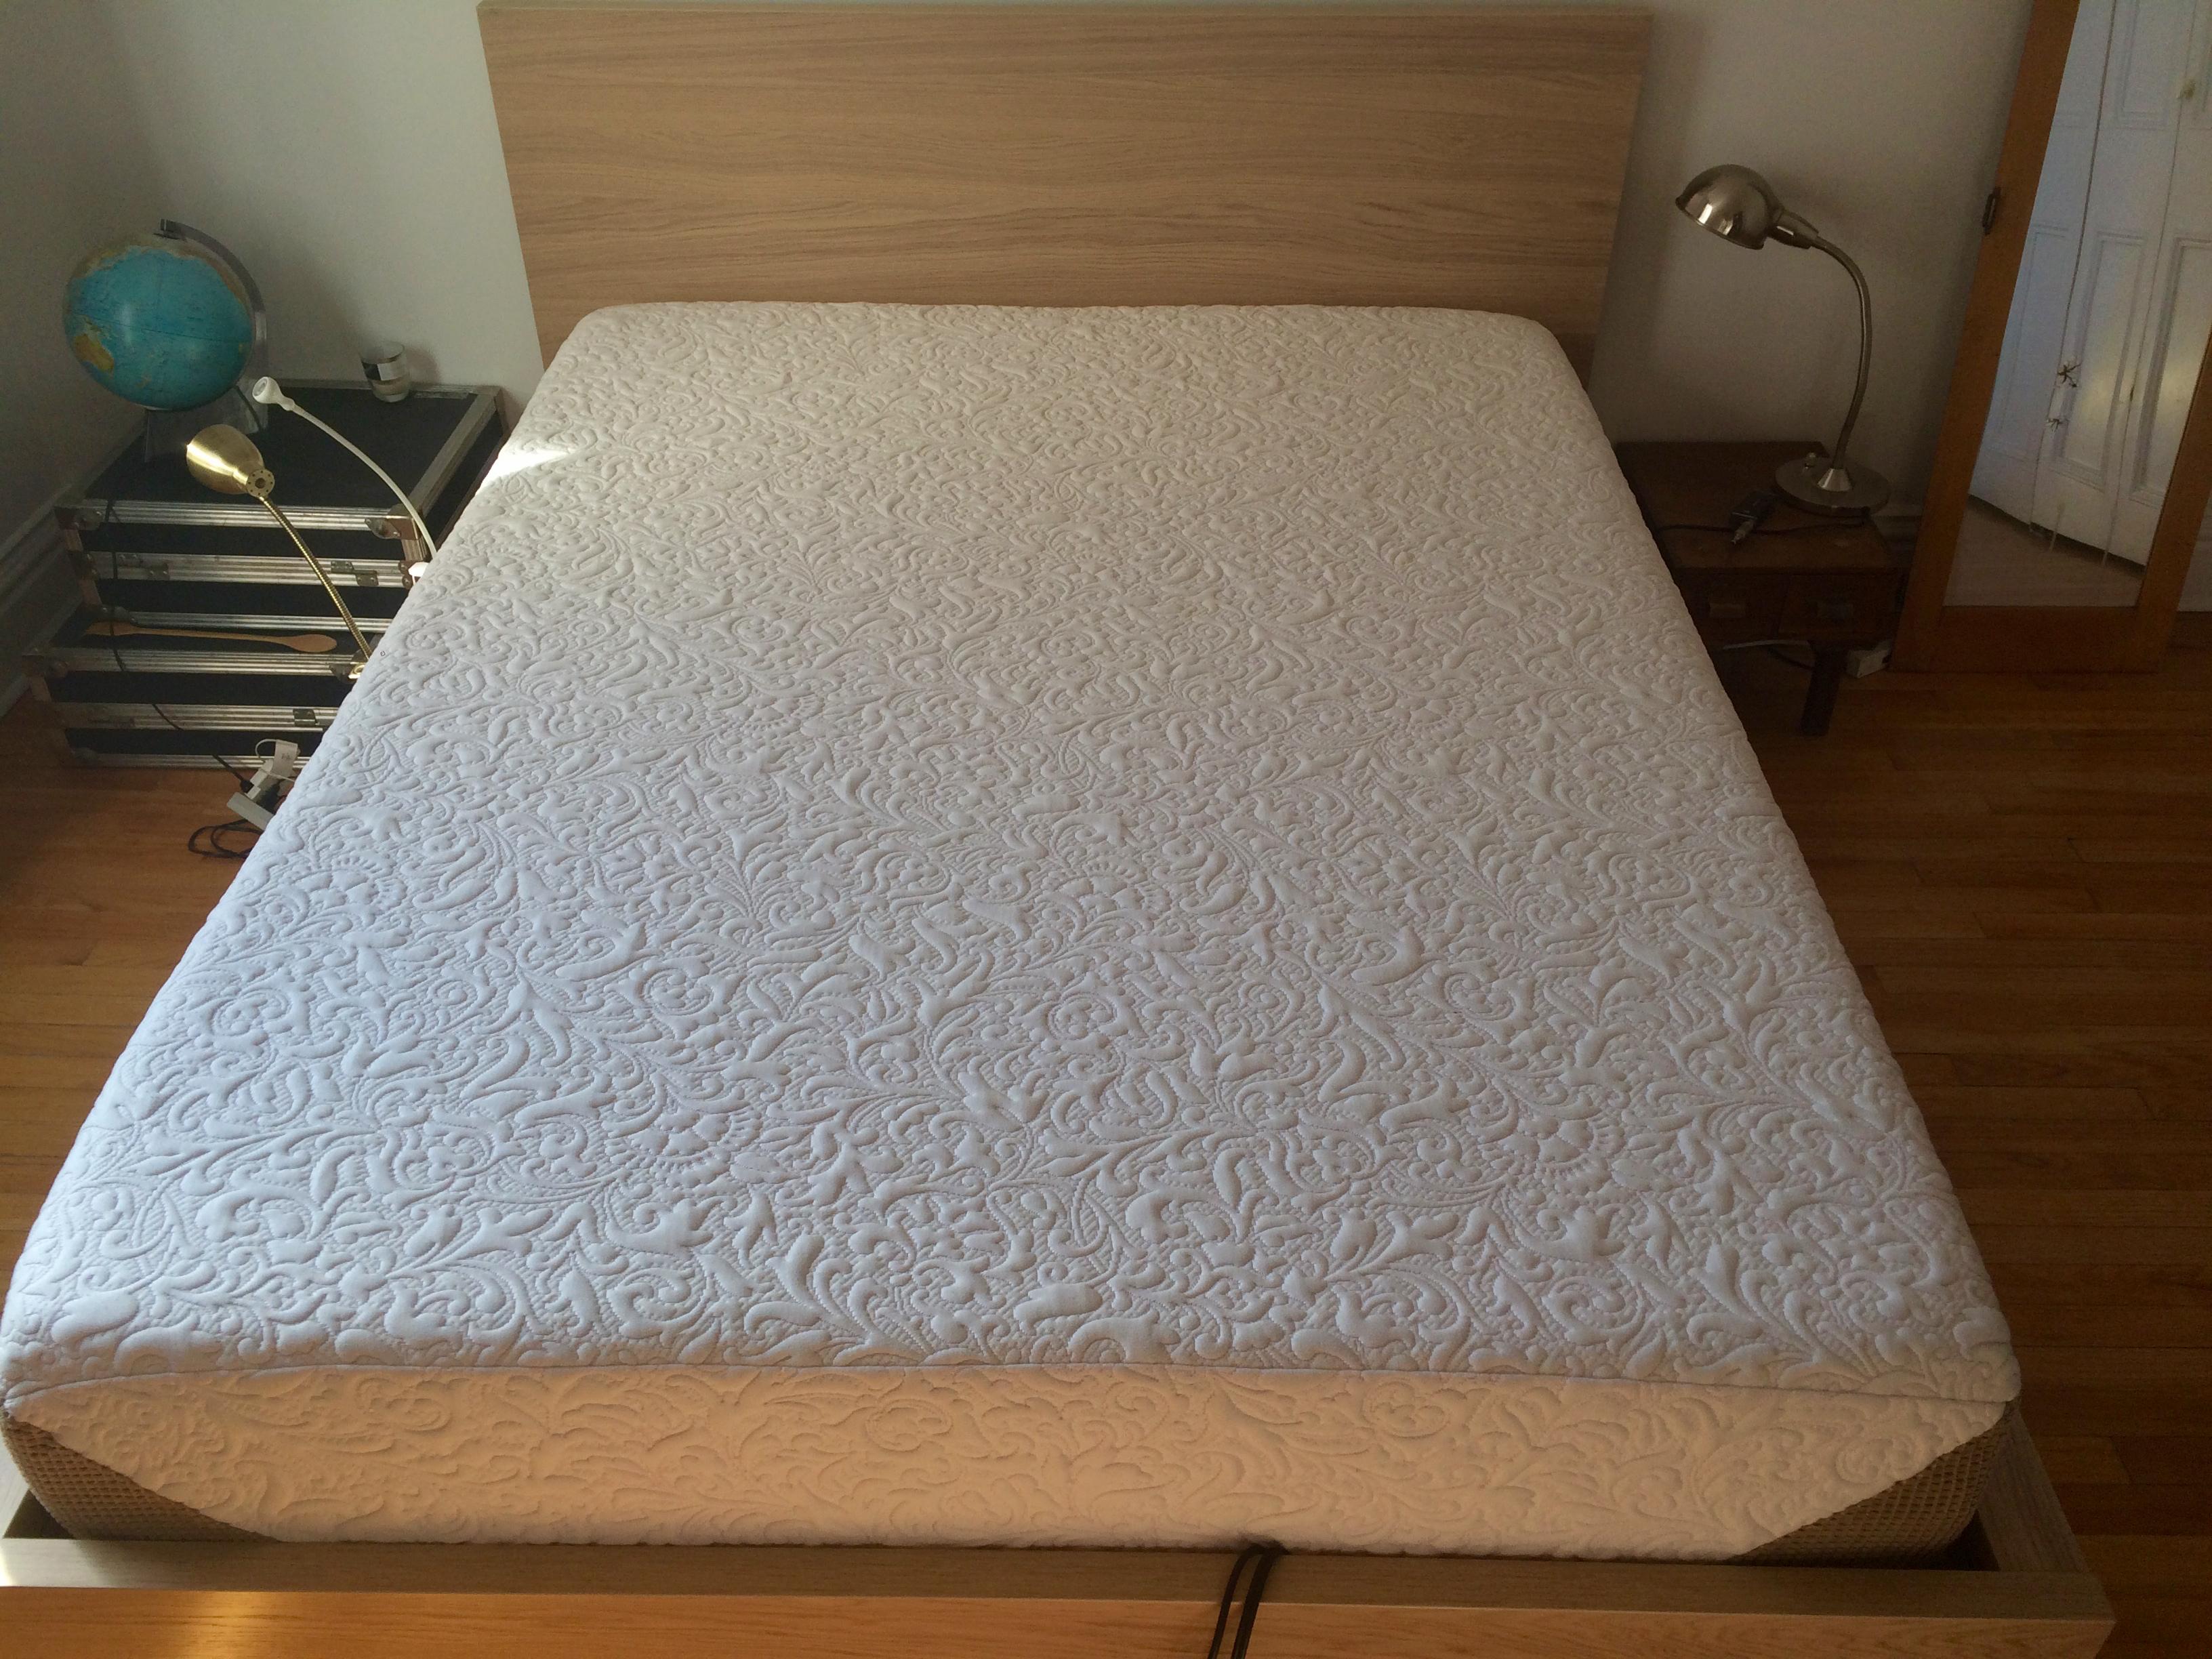 lit queen ikea malm haut matelas serta icomfort genius 490 mobilier et mat riel. Black Bedroom Furniture Sets. Home Design Ideas